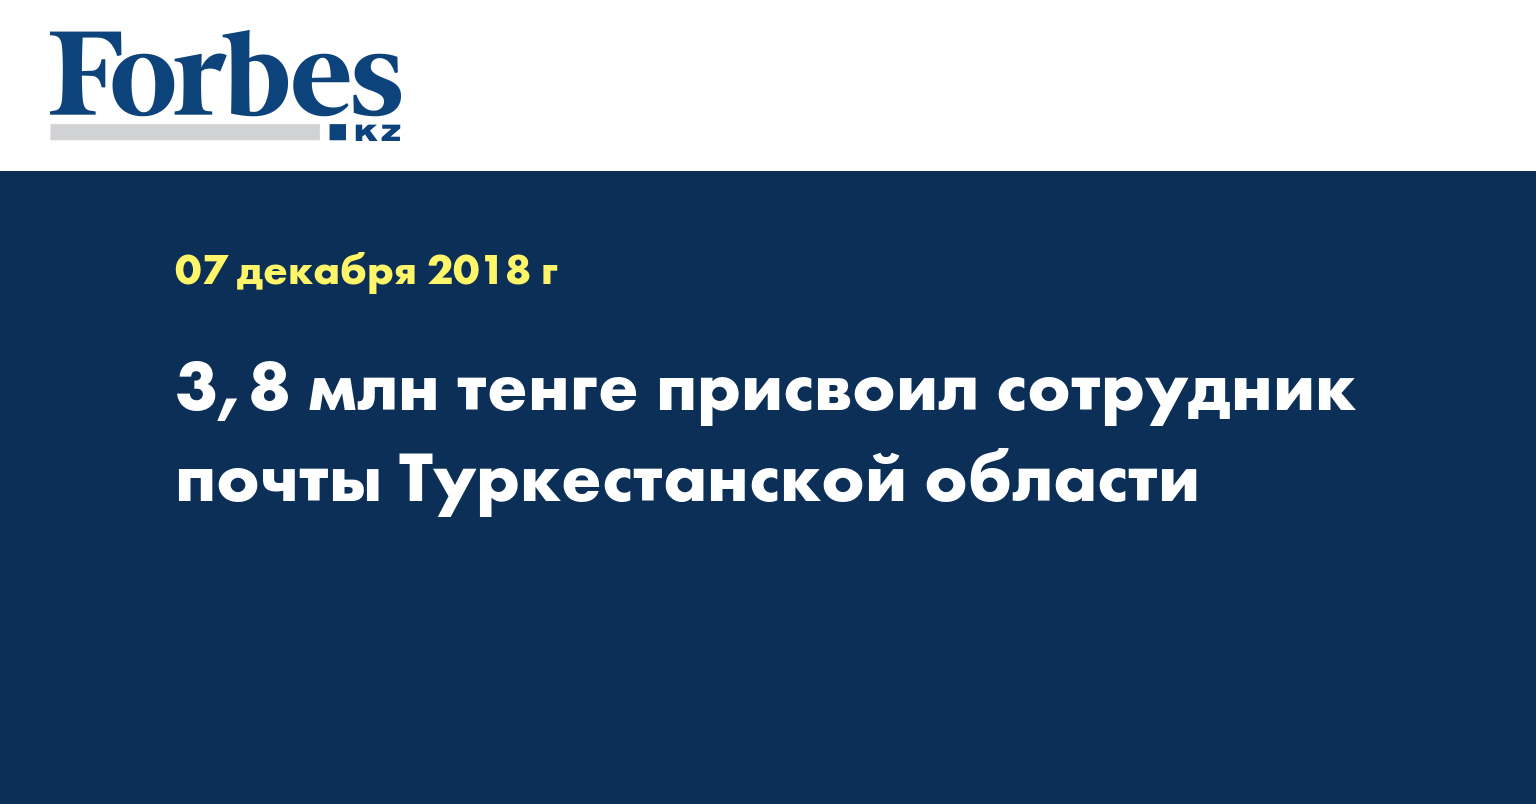 3,8 млн тенге присвоил сотрудник почты Туркестанской области